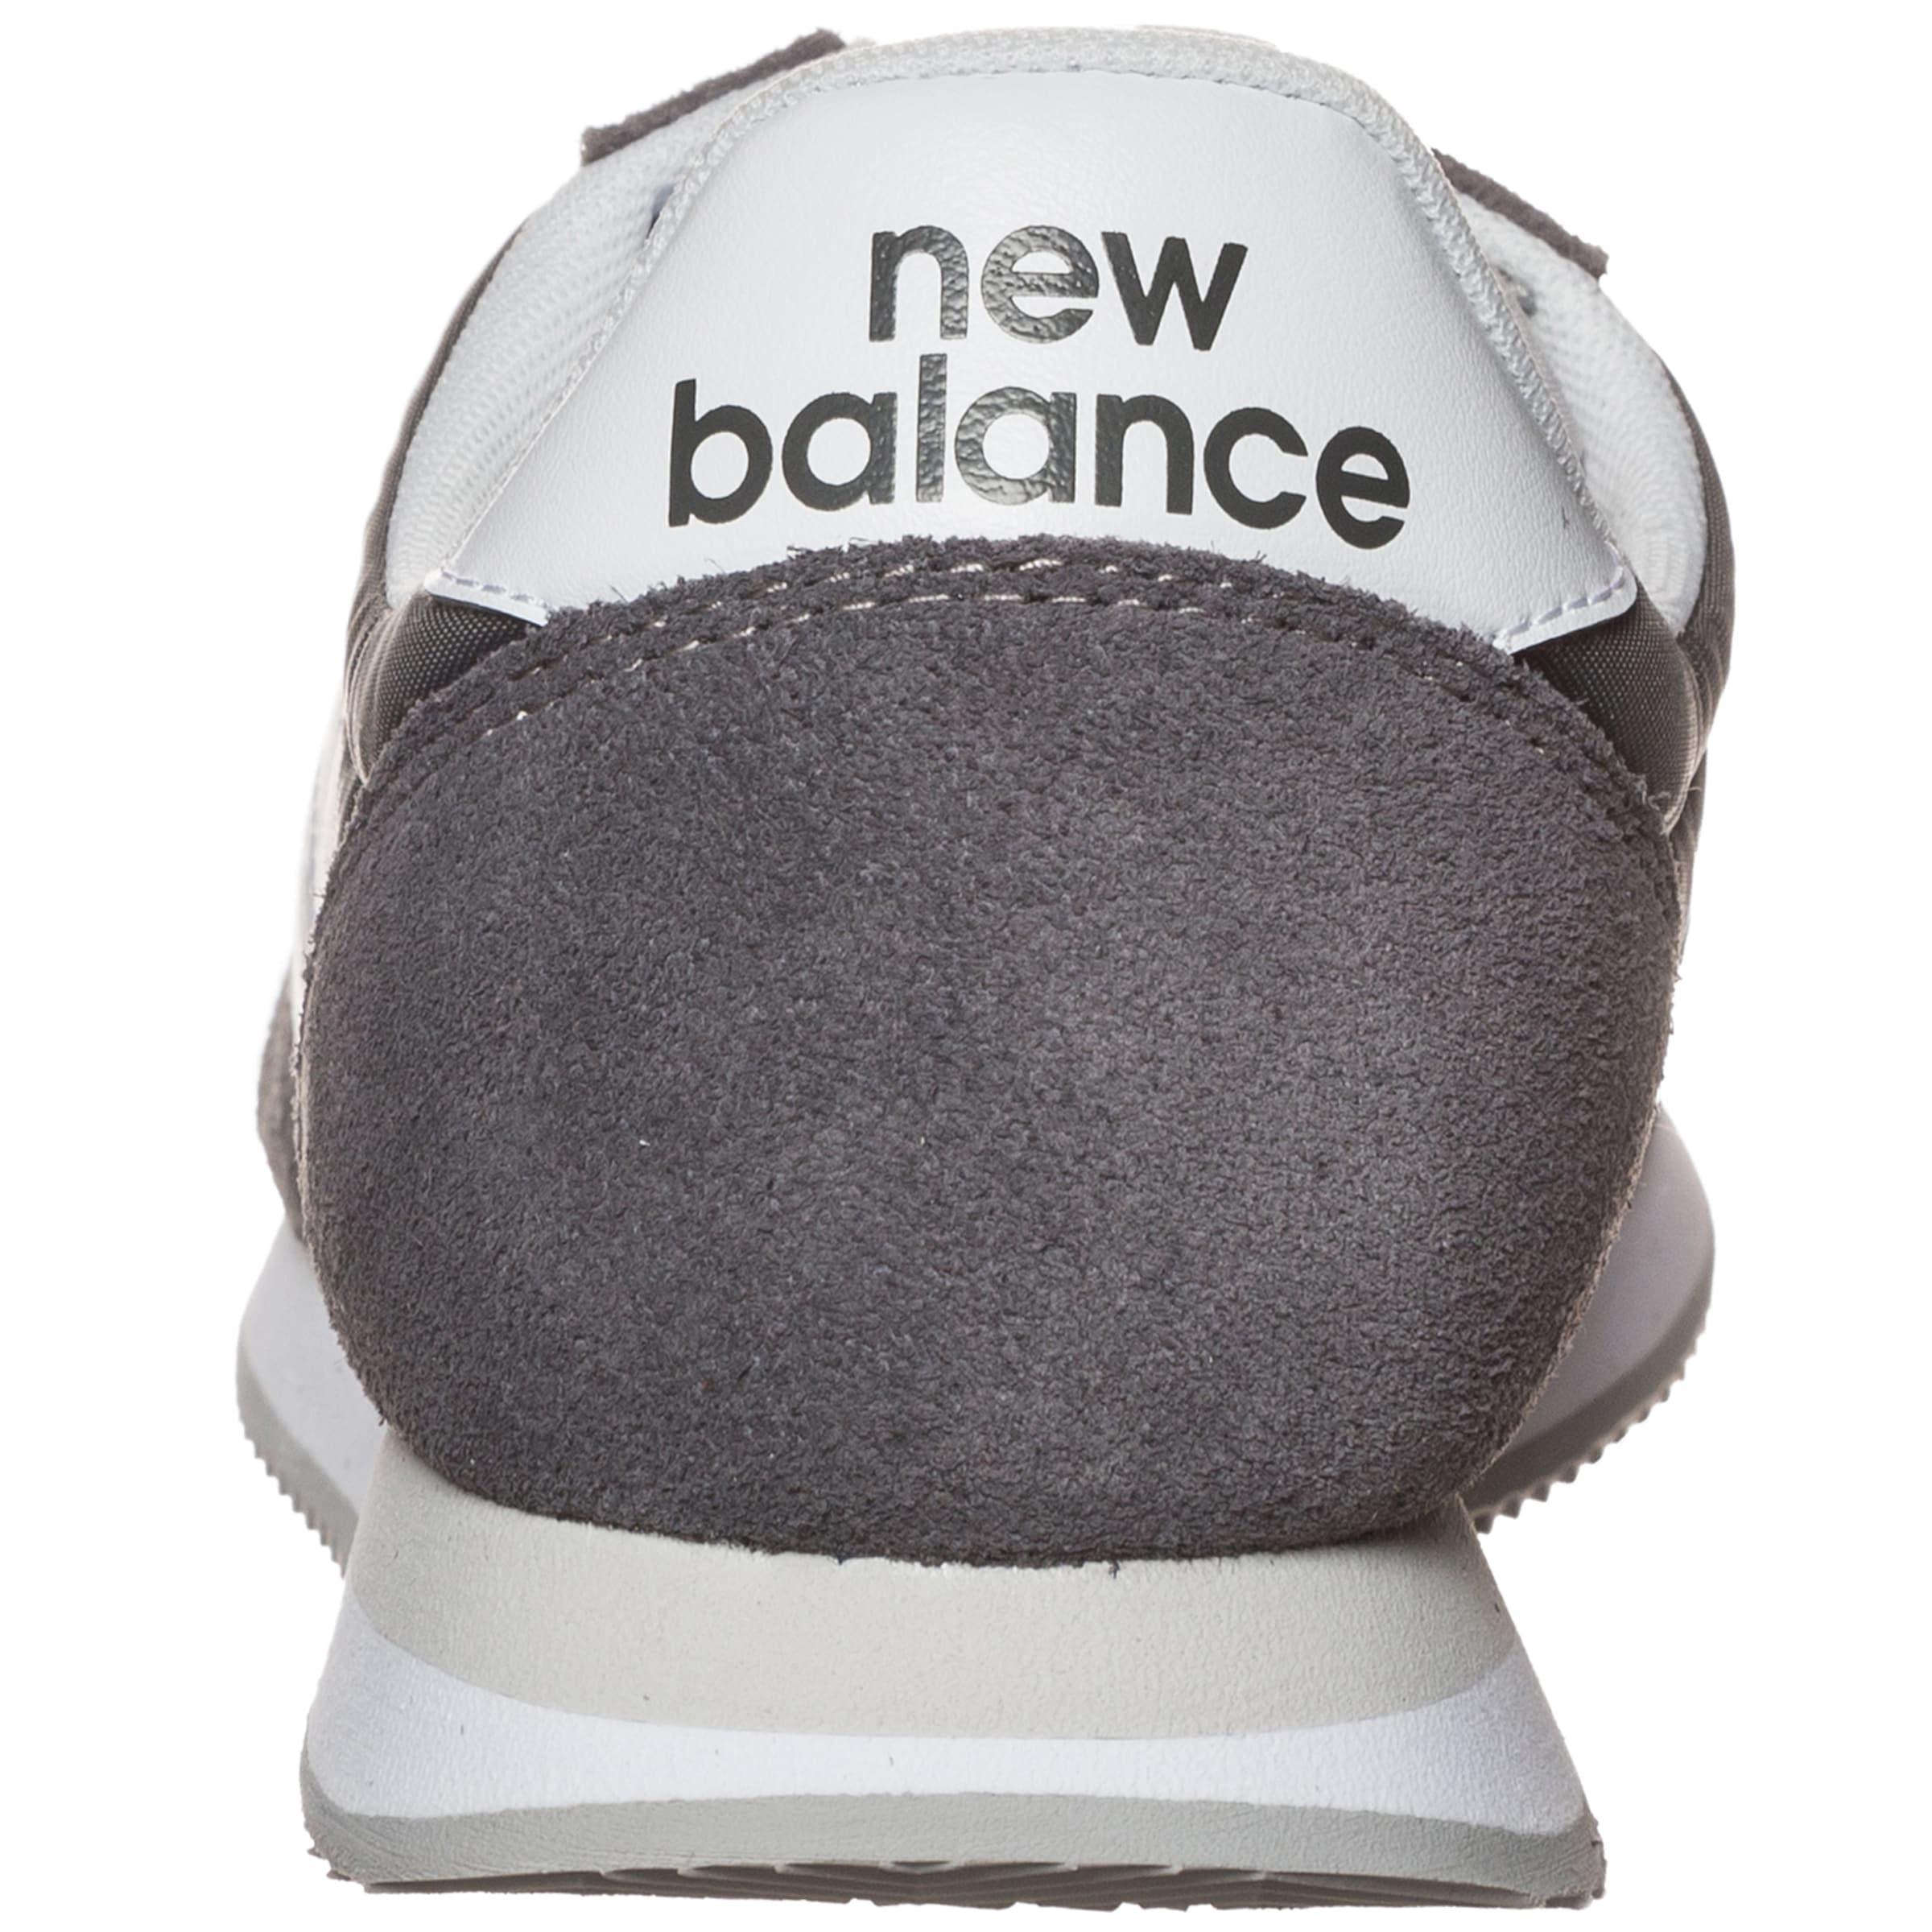 New d'' GrisBlanc 'u220 Balance Baskets En Basses gy QCxBWdoer